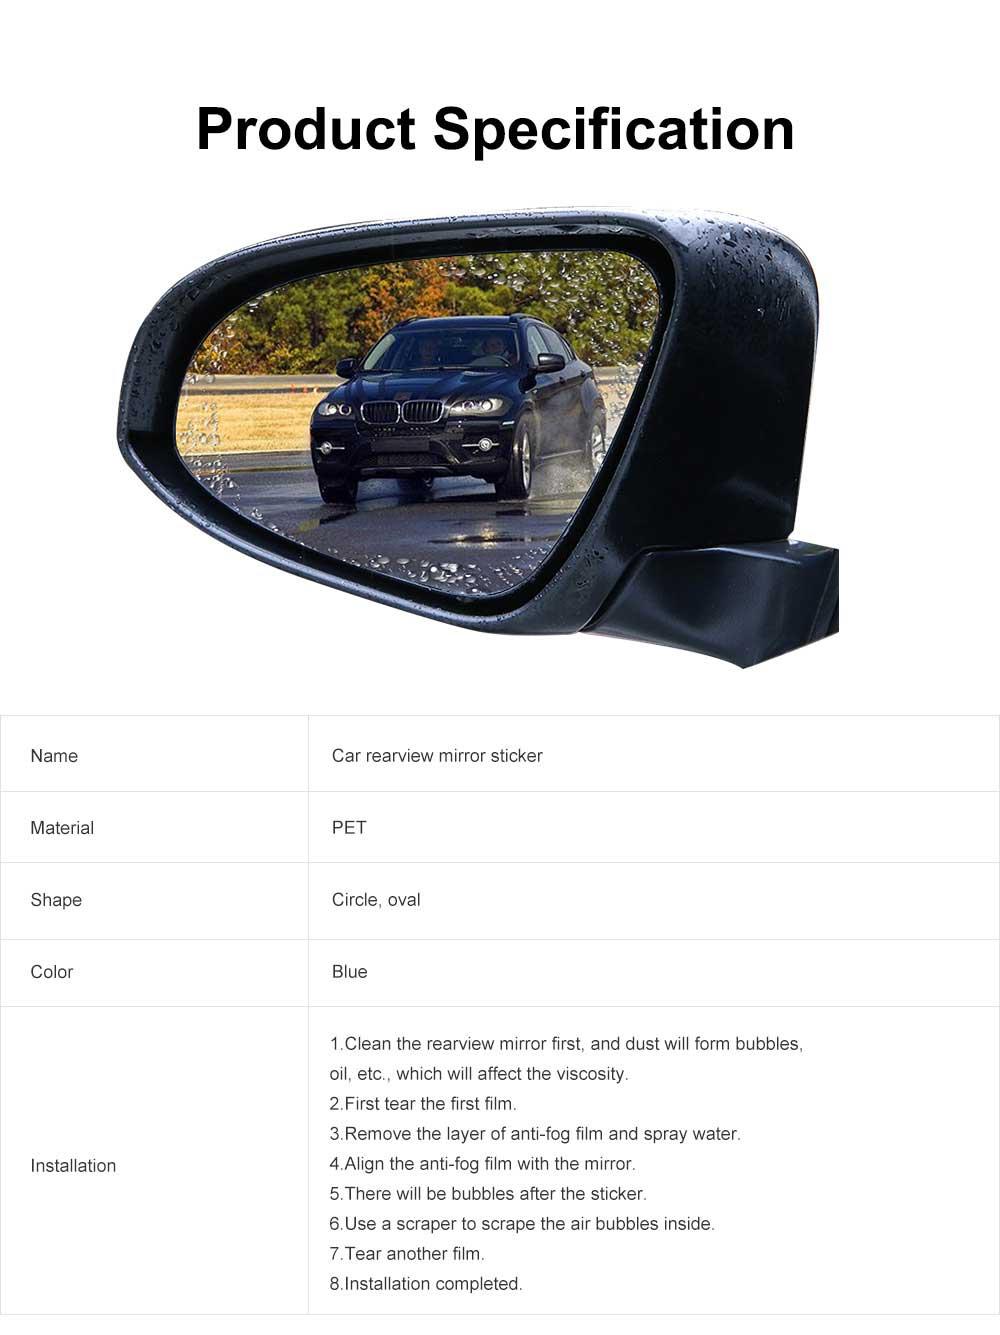 Waterproof Anti-fog Film Car Rearview Mirror Sticker, Anti-glare Anti-Reflection Car Window Pasting Anti Reflective Film 2PCS 5